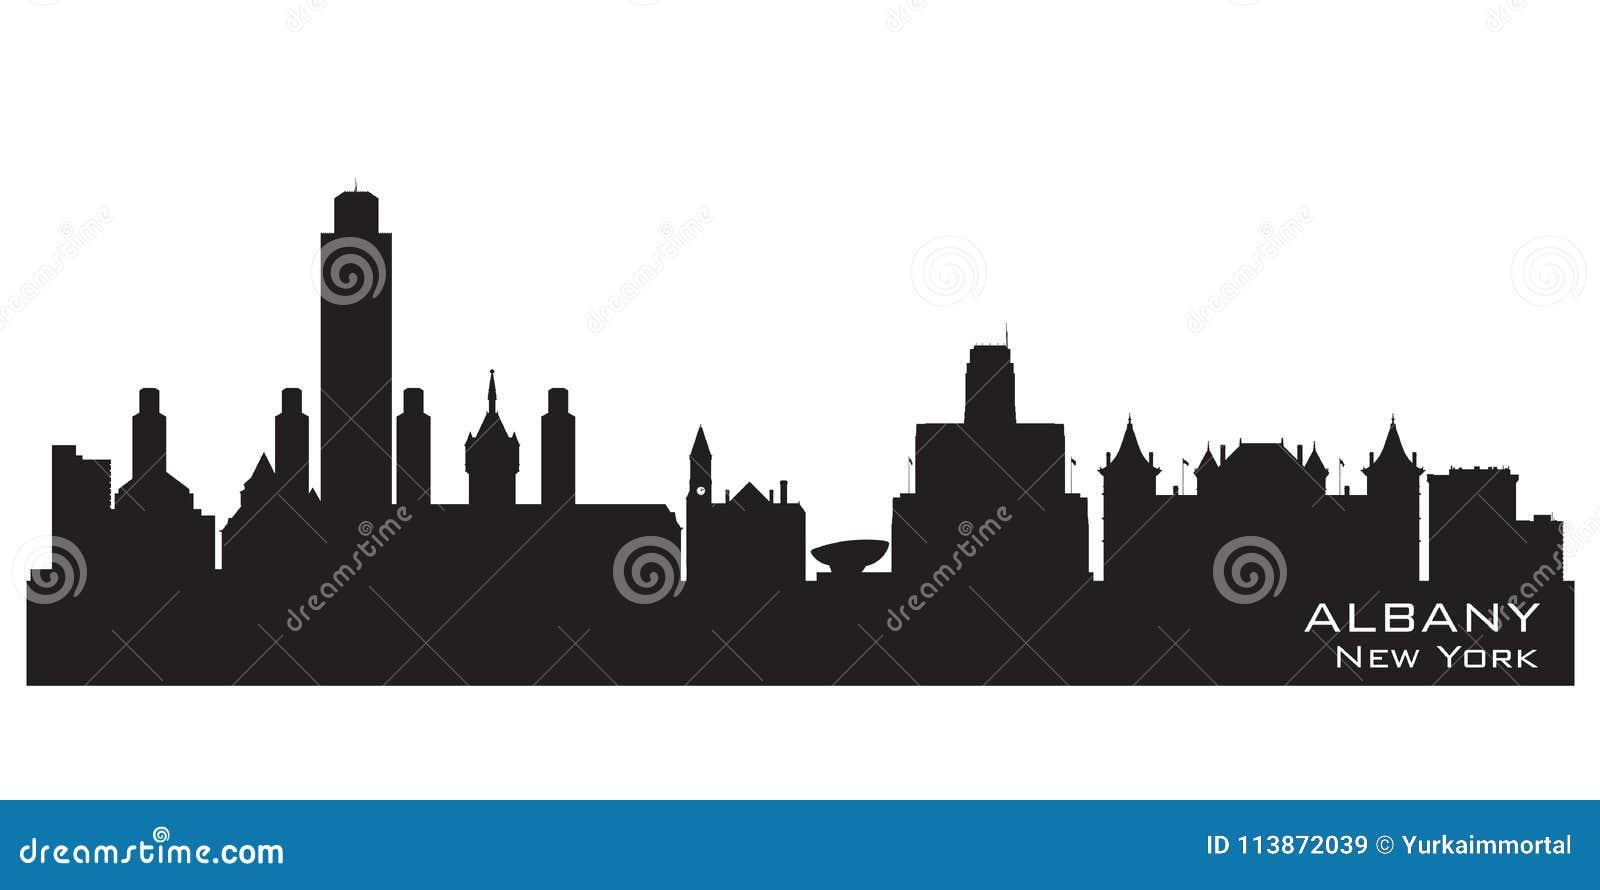 Albany New York City Skyline Vector Silhouette Stock Vector